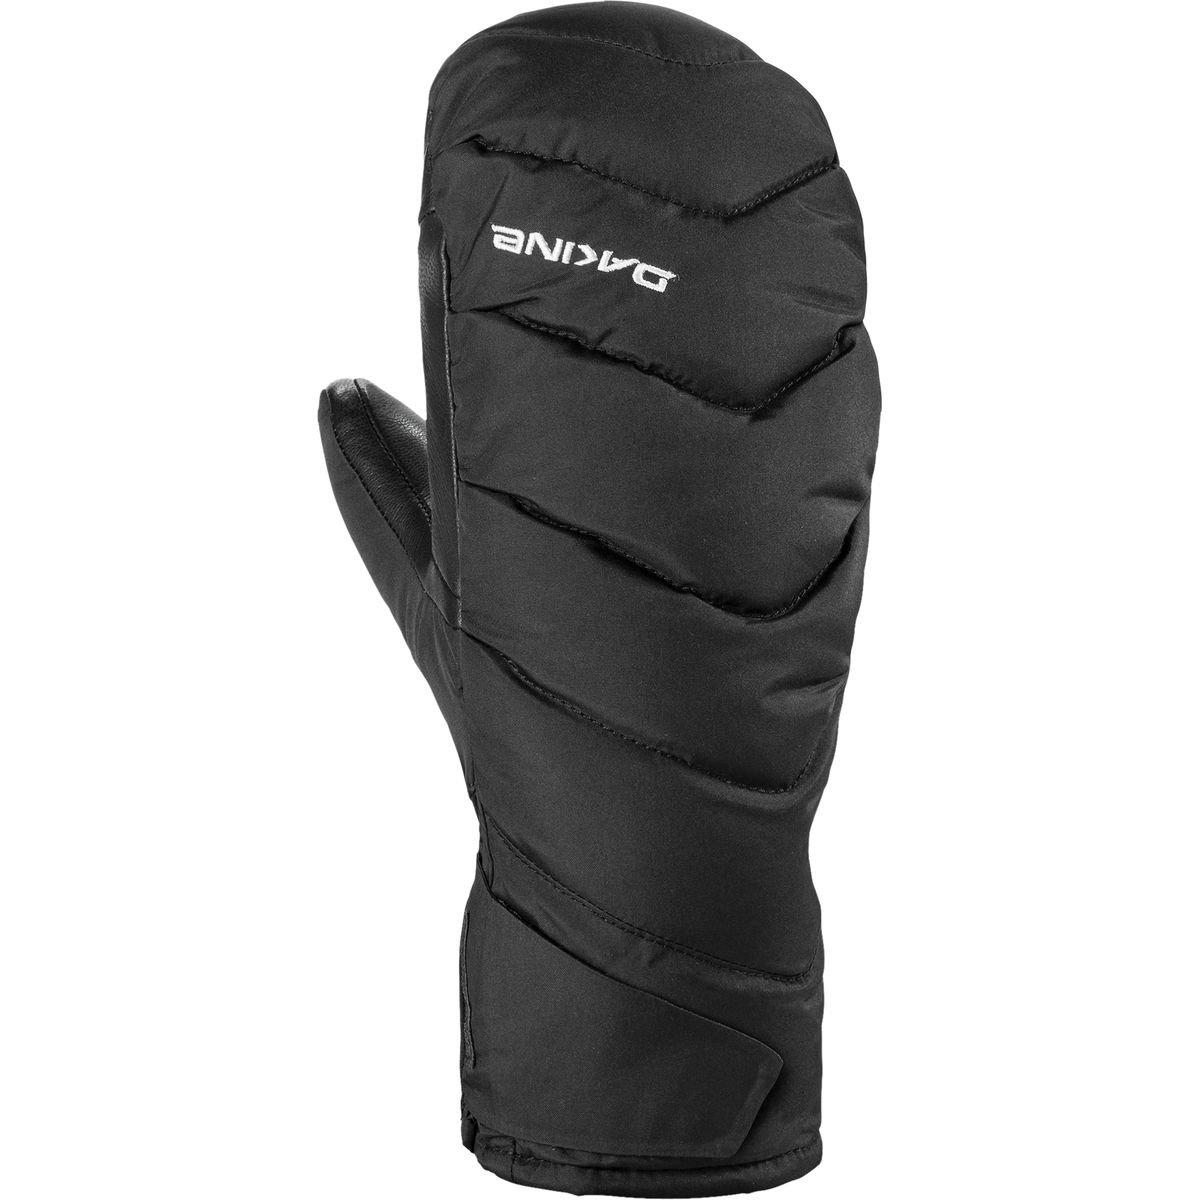 Dakine Women's Tundra Mitt Waterproof Gloves, Black, M by Dakine (Image #1)